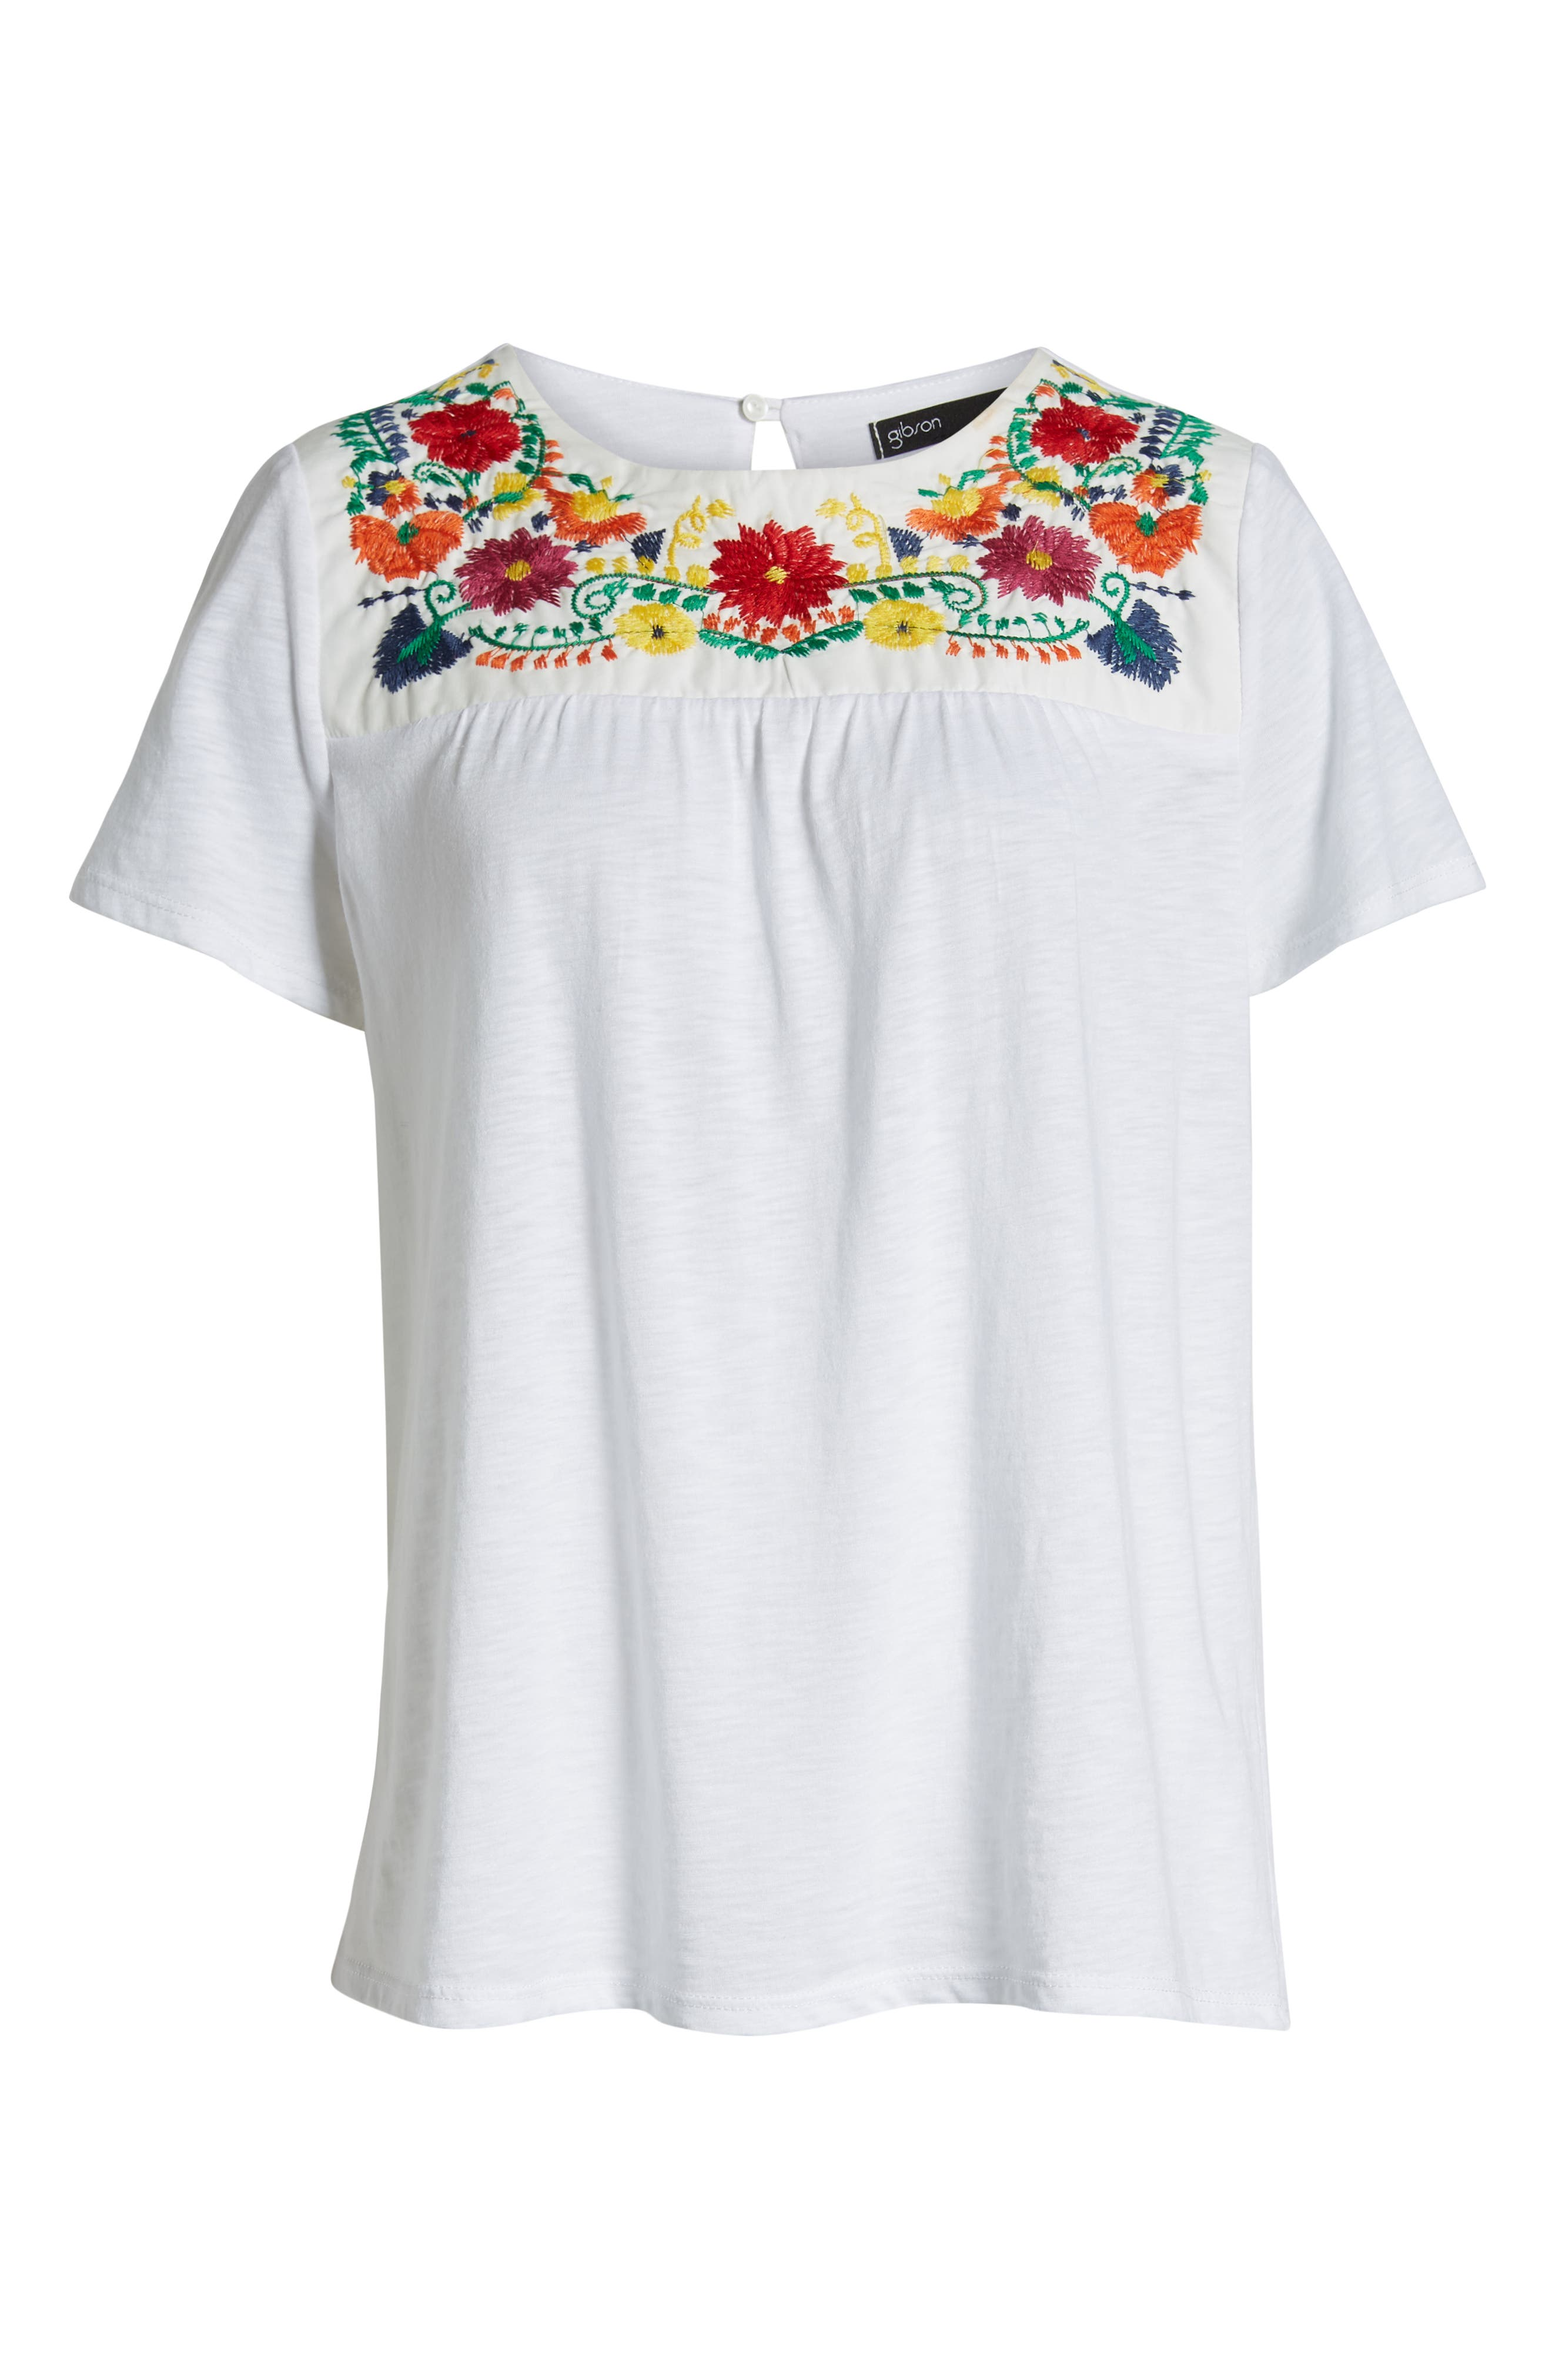 x Hi Sugarplum! Savannah Embroidered Yoke Tee,                             Alternate thumbnail 6, color,                             WHITE MULTI COLOR